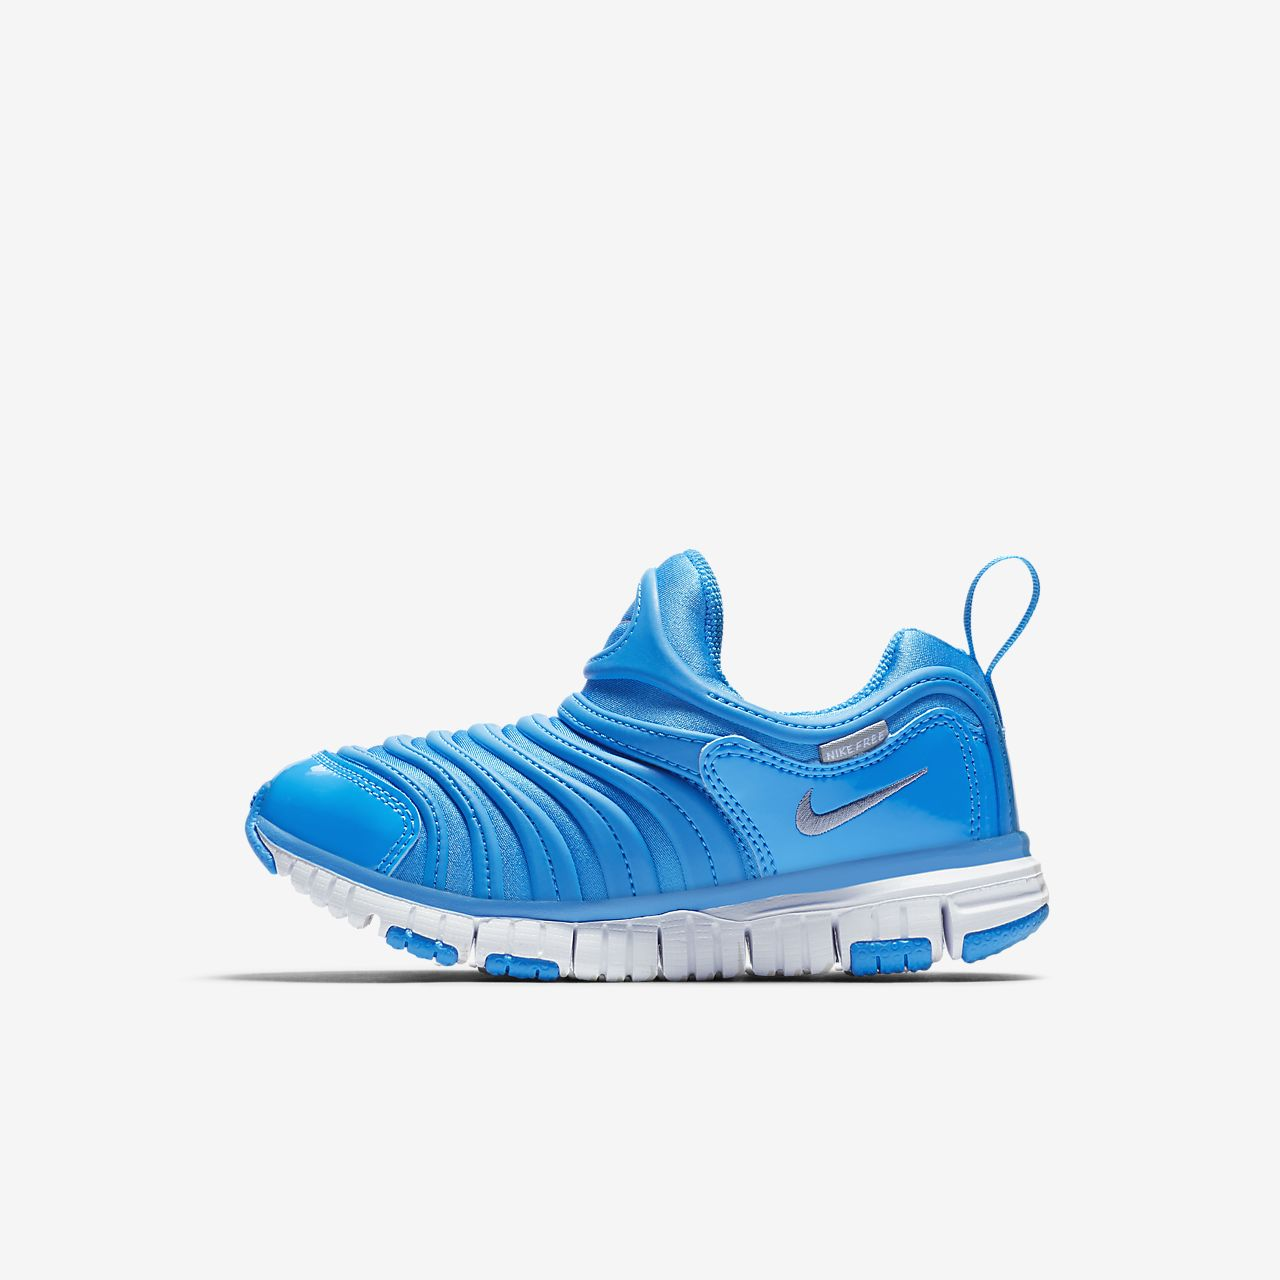 Calzado para niños de talla pequeña Nike Dynamo Free